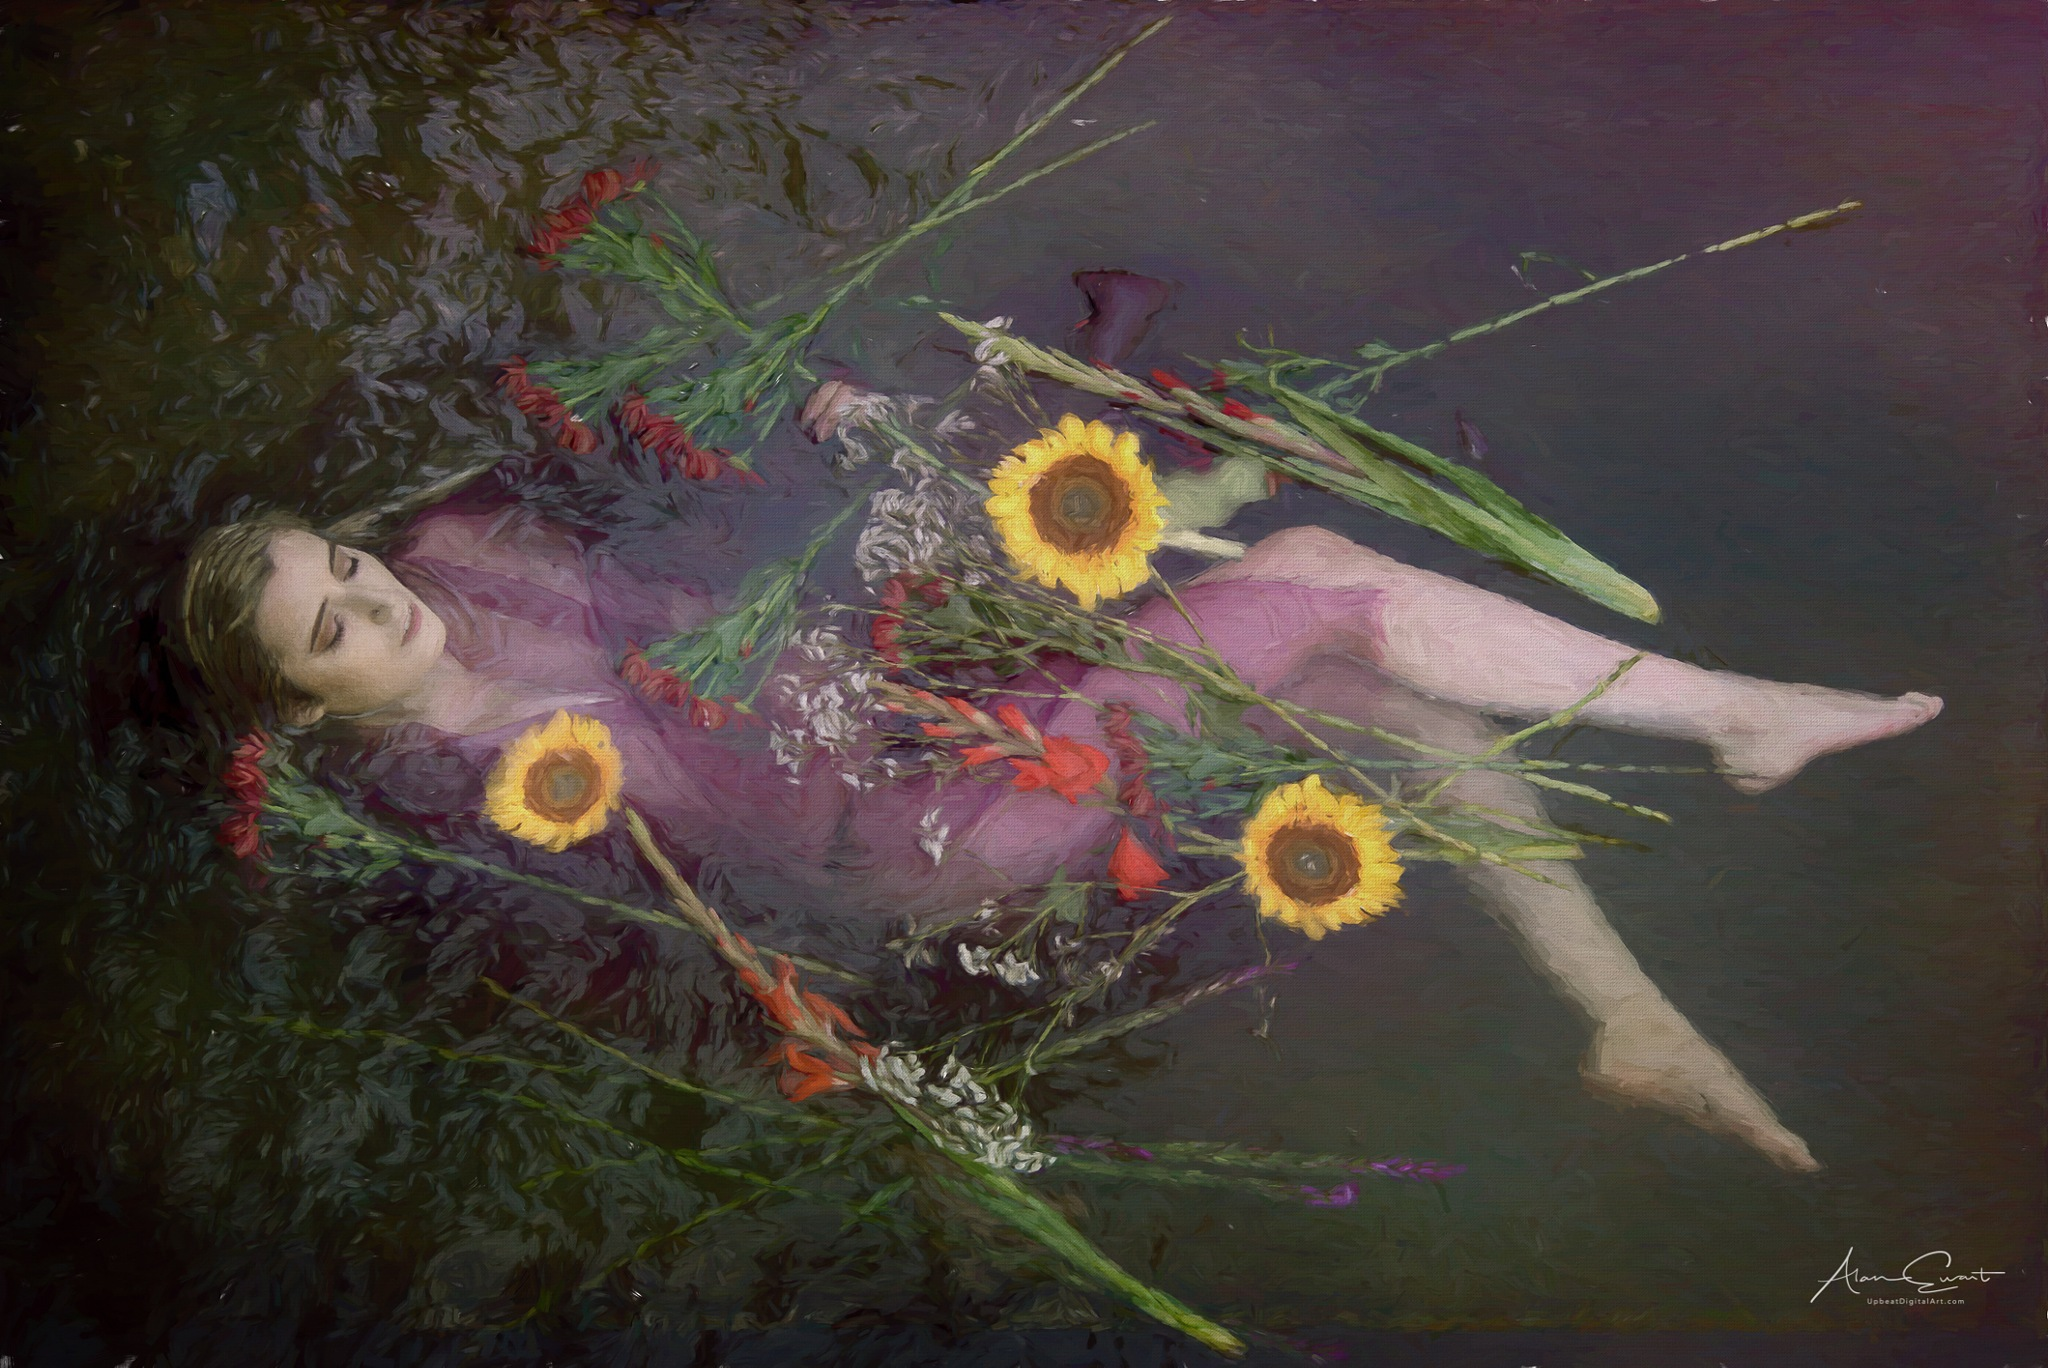 Ophilia version 2 by Alan Ewart